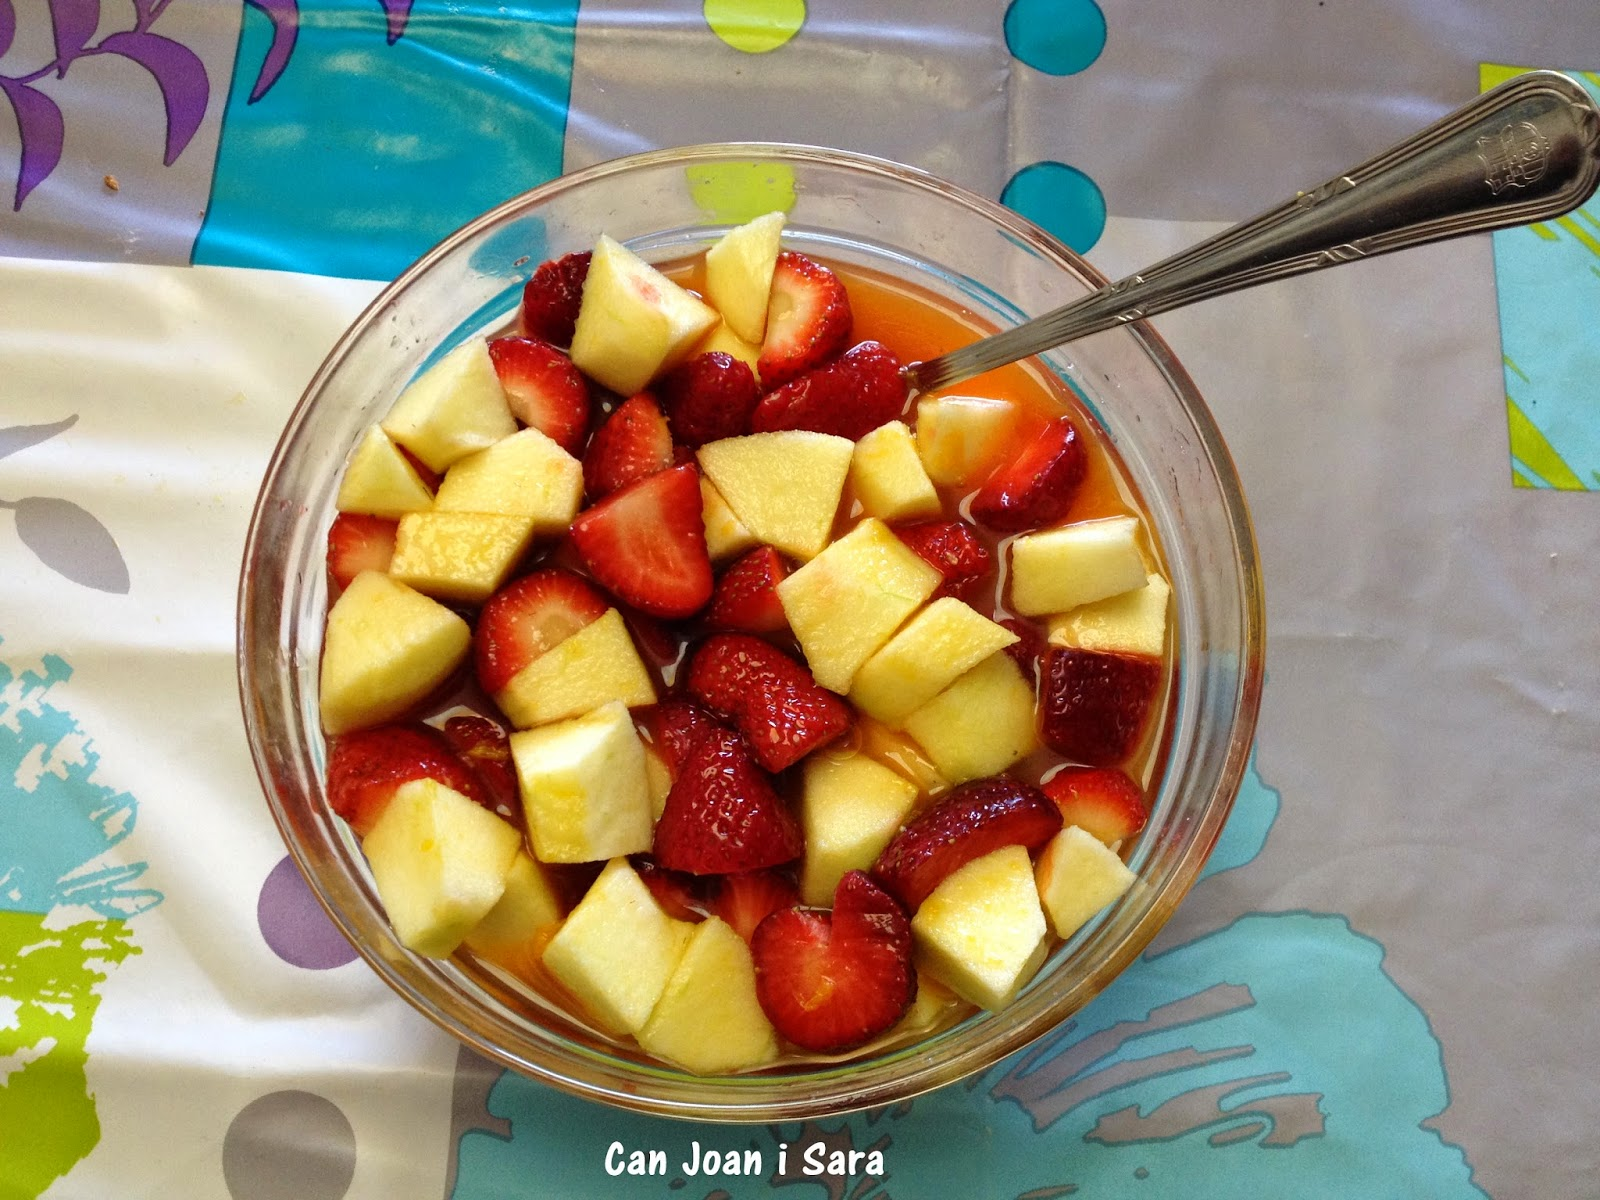 Fresas y manzana con zumo de mandarinas recetas de cocina - Postre con mandarinas ...